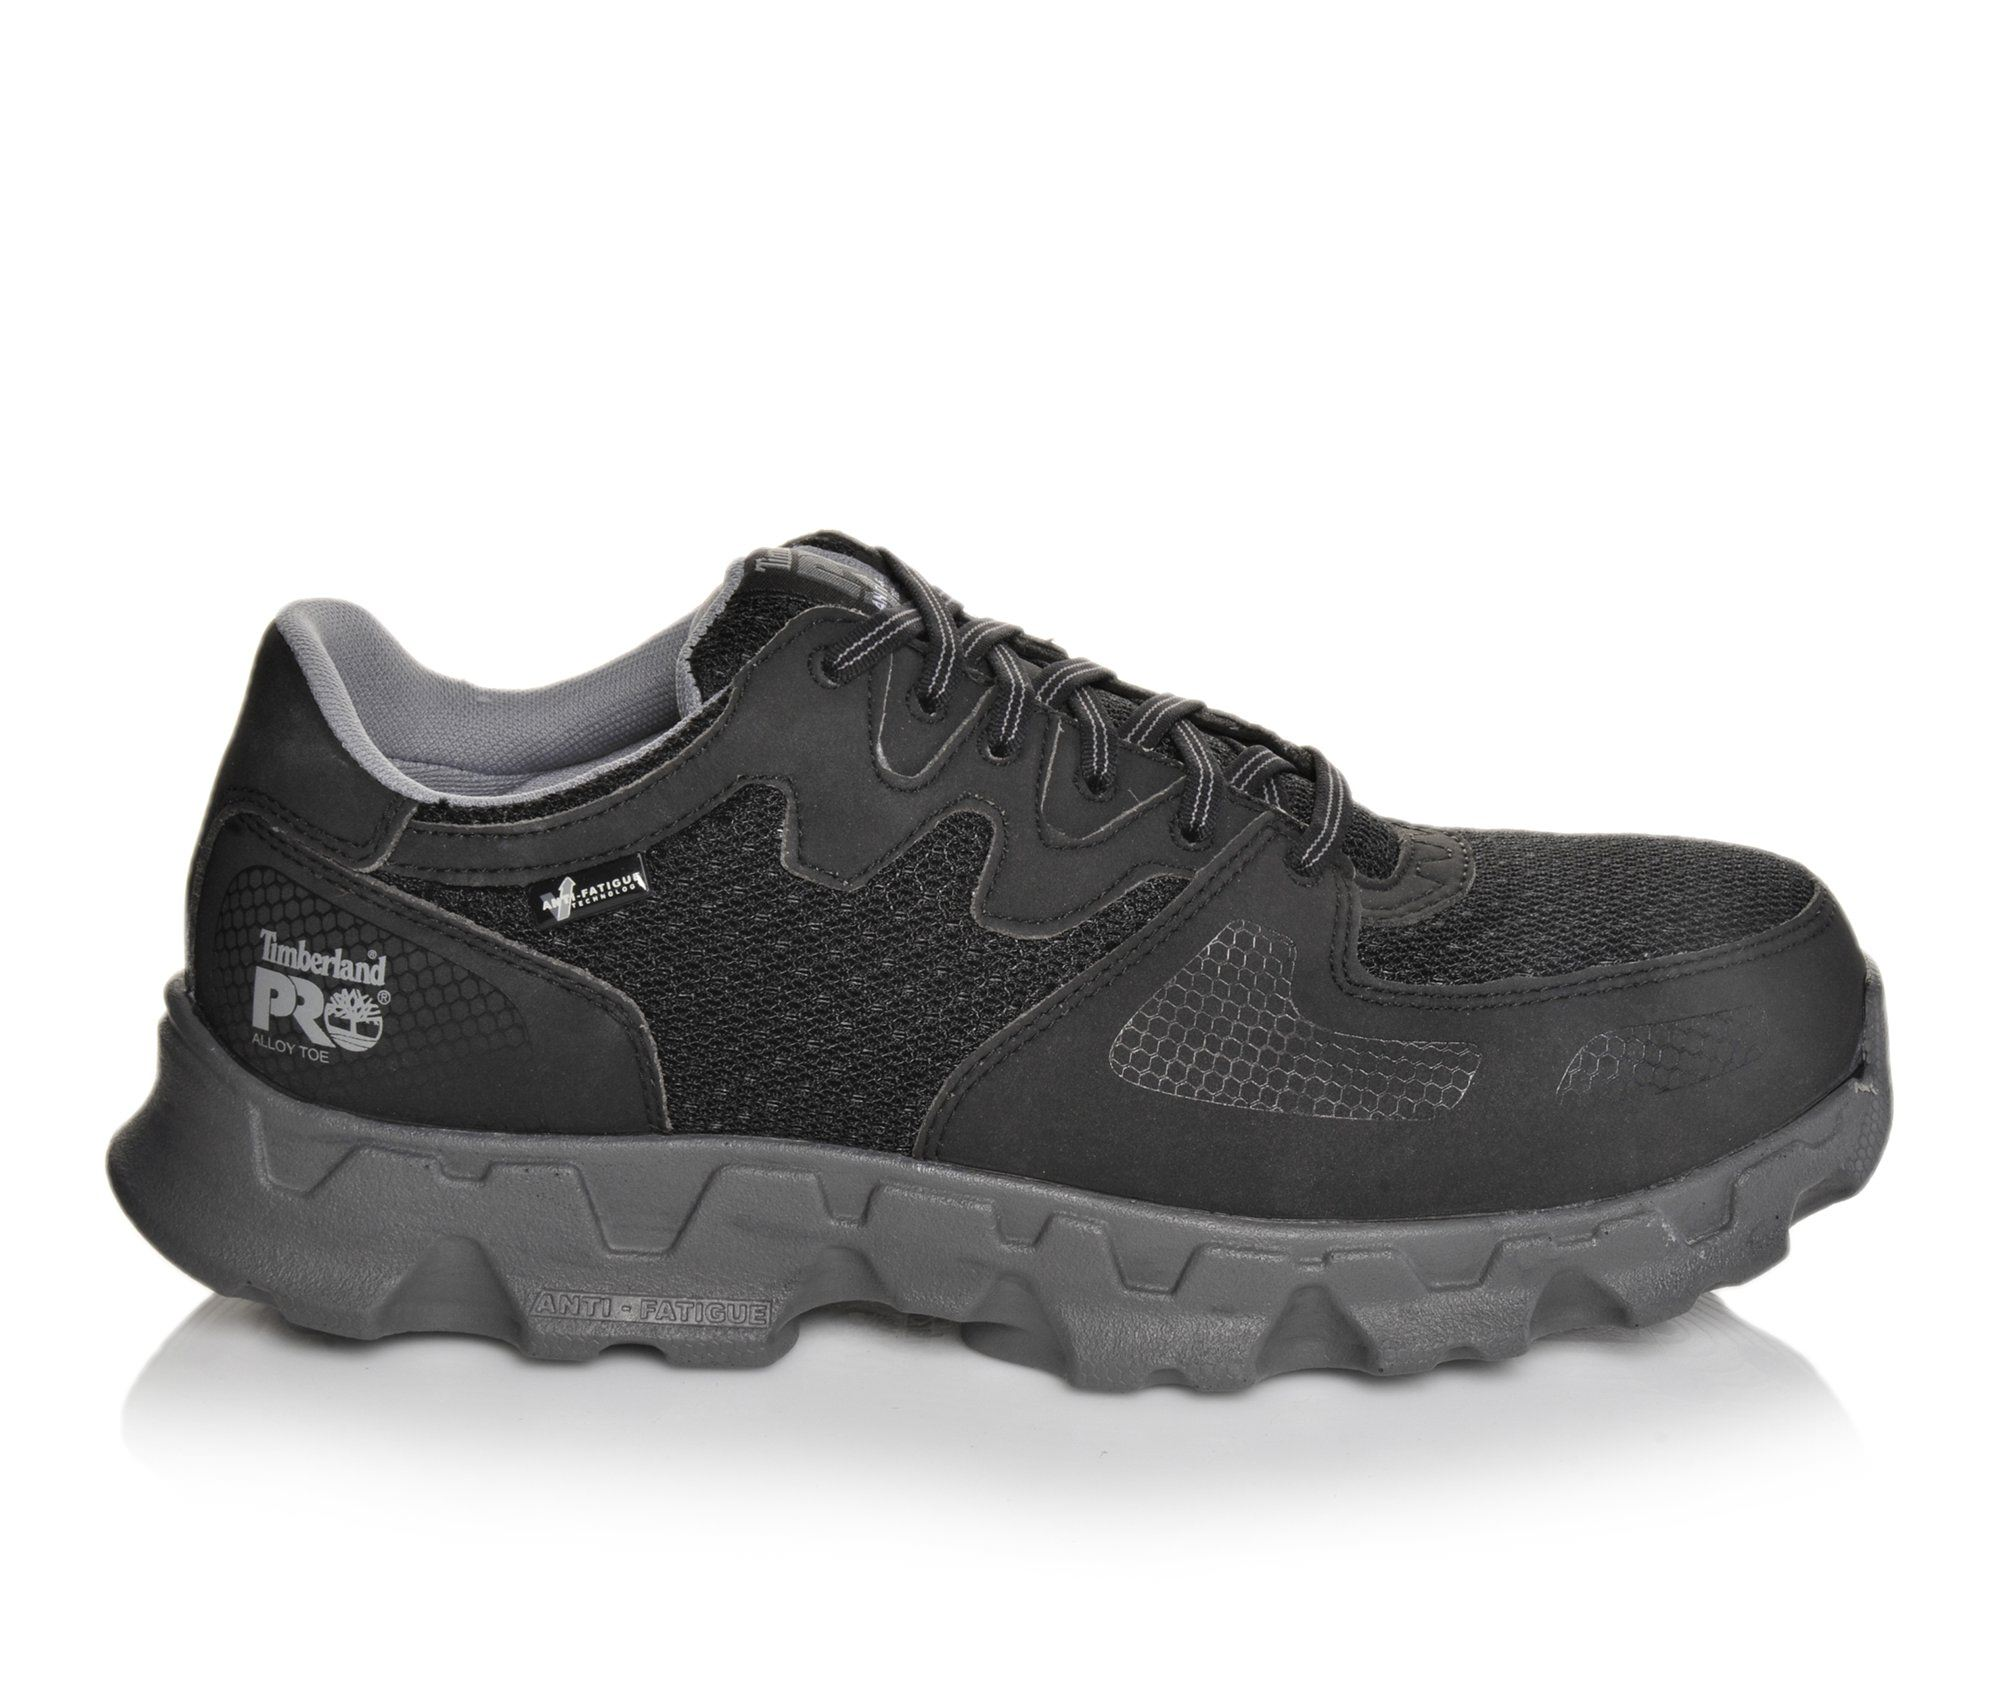 Timberland Pro Powertrain 92649 Alloy Toe Men's Boots (Black Leather)